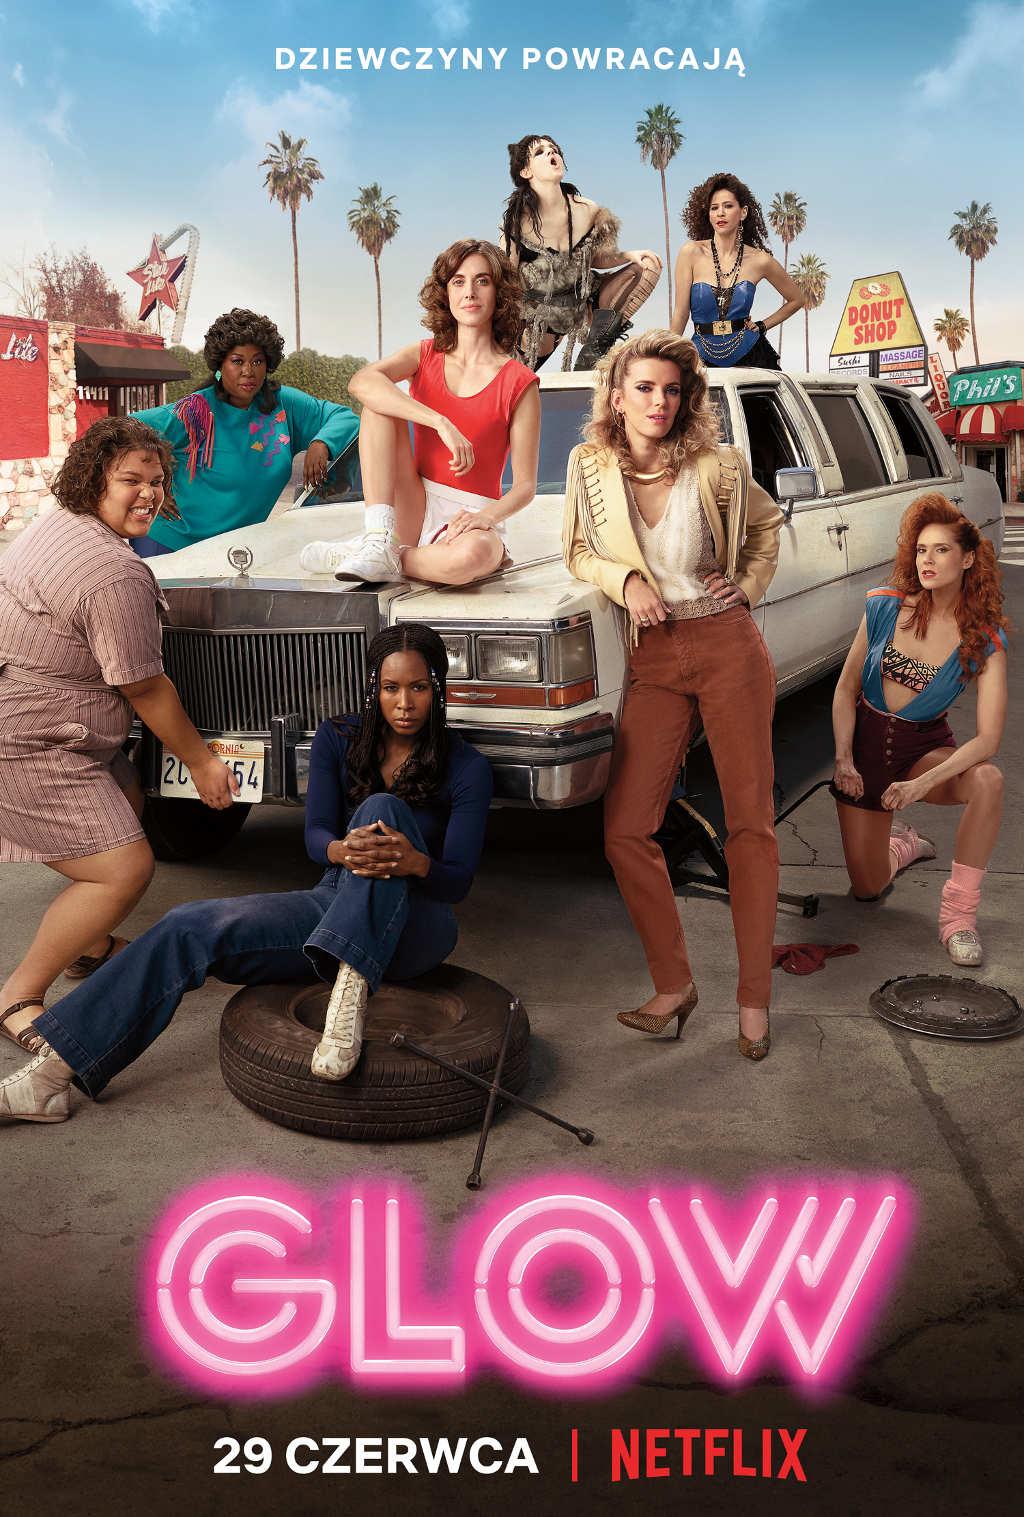 Netflix Glow s2 poster